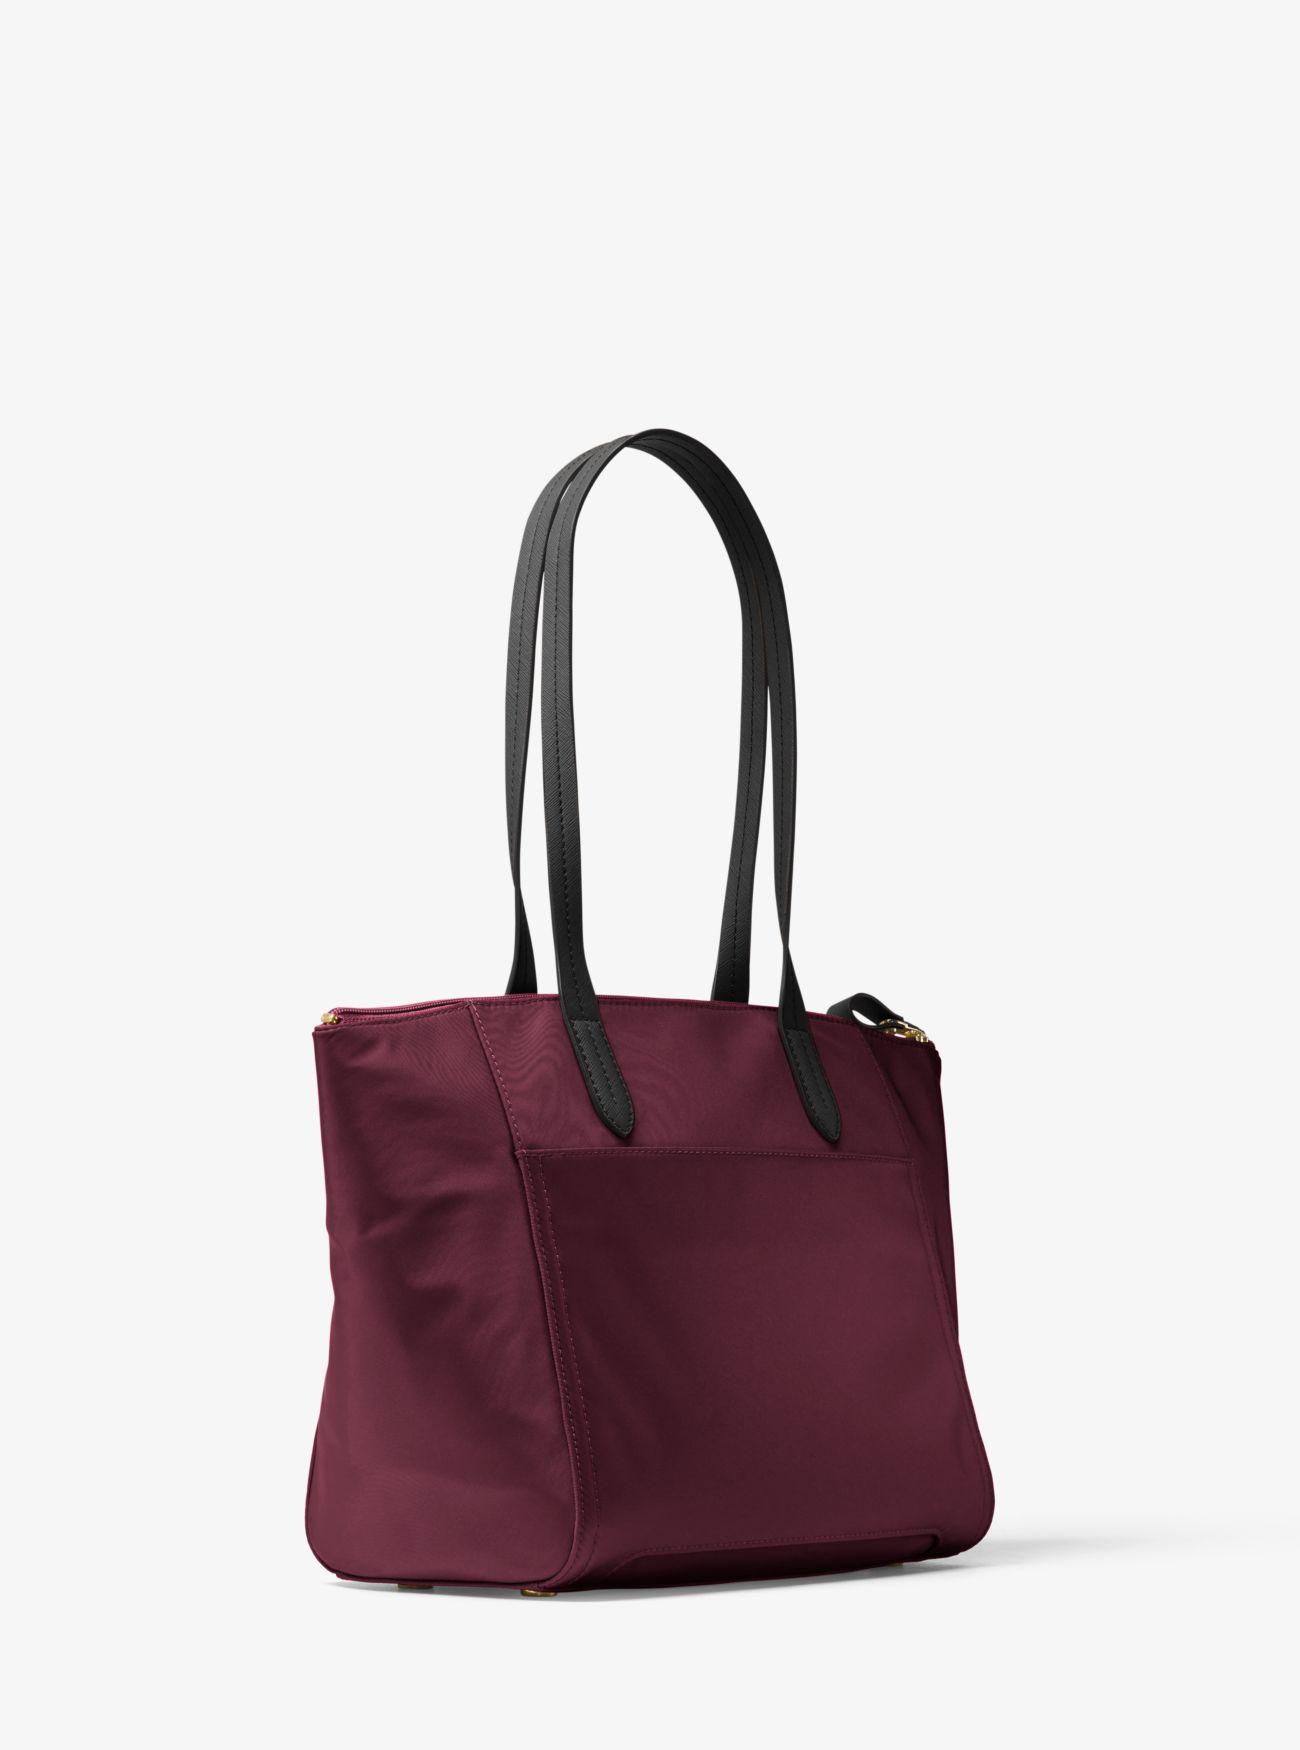 478bbb3ebf798 ... Kelsey Medium Nylon Tote Bag Kelsey Medium Nylon Tote Bag. MICHAEL  Michael Kors